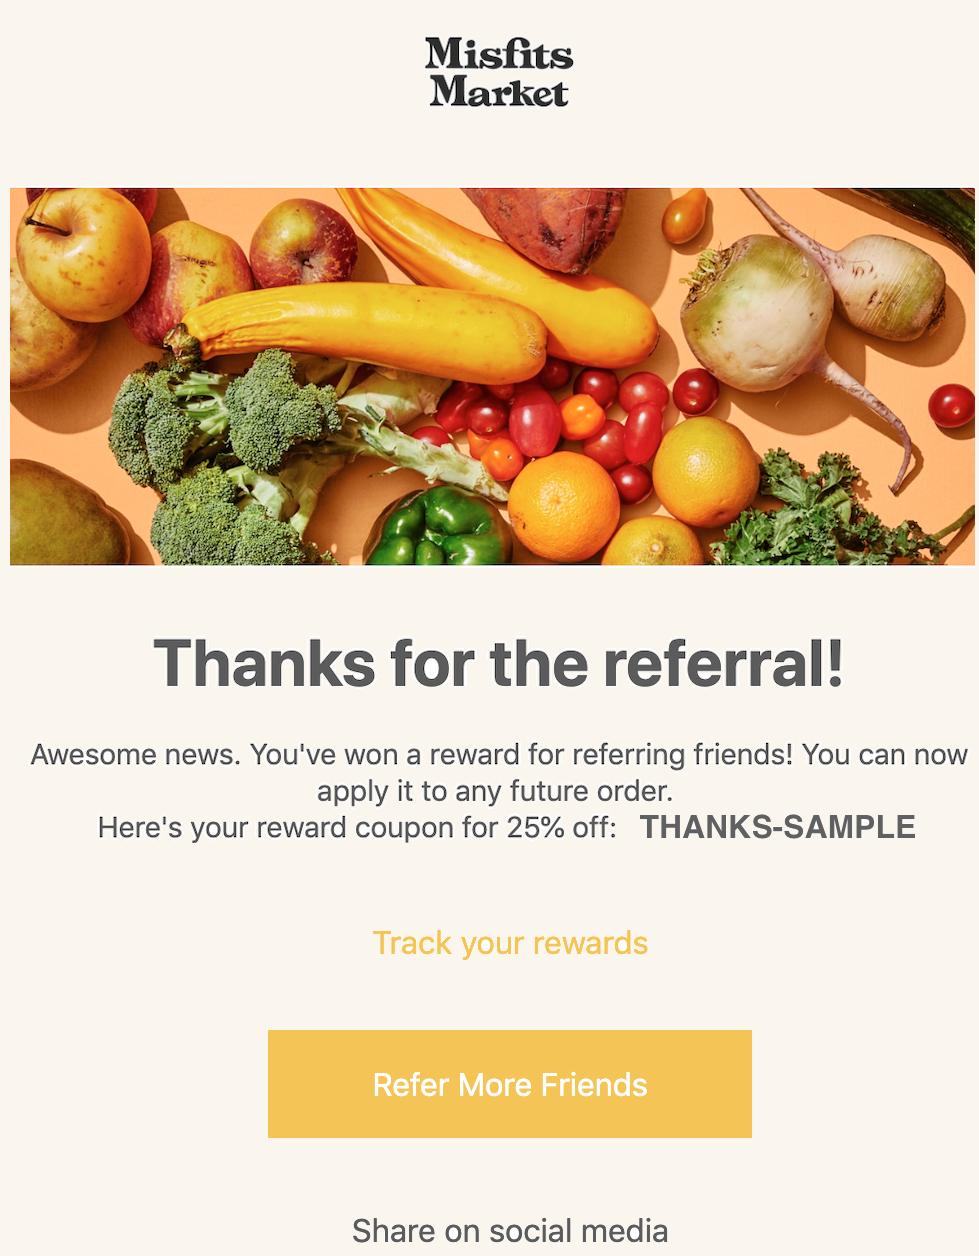 Misfits Market referral email